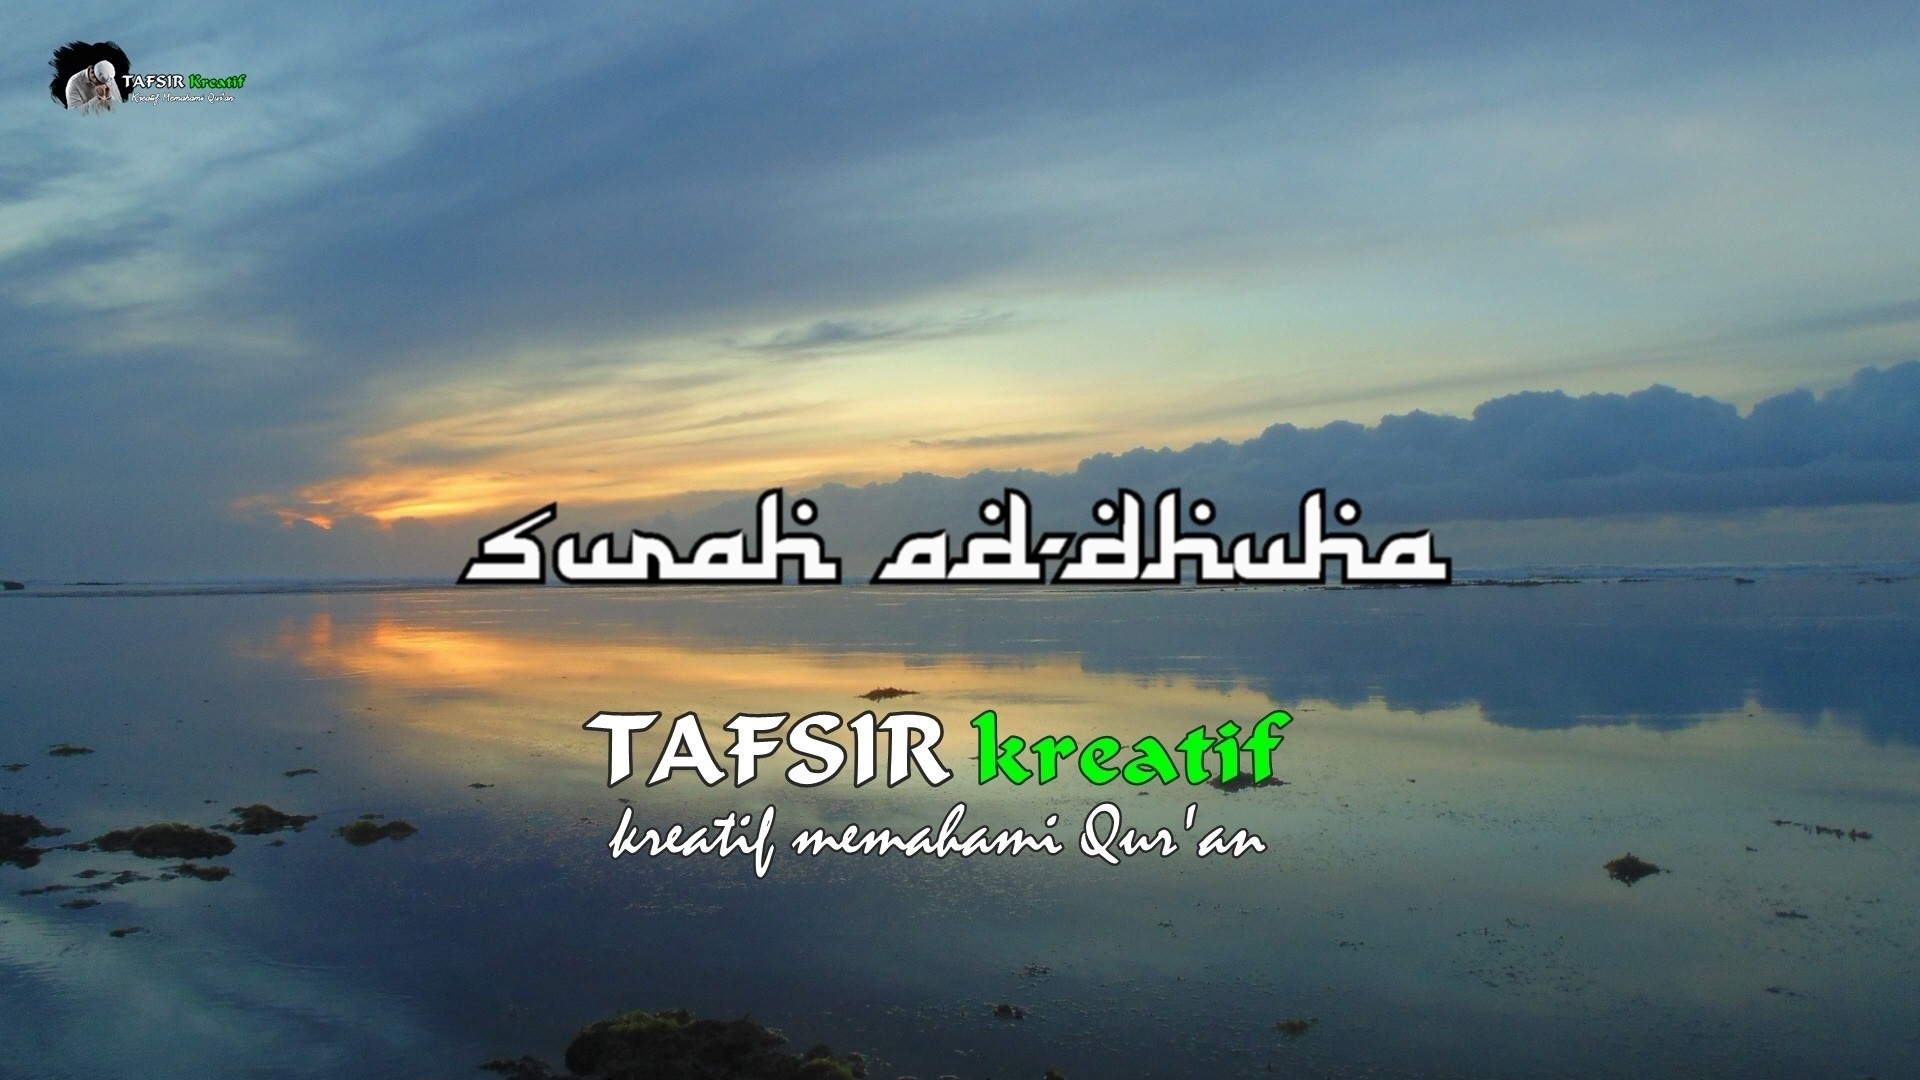 Lantunan Ayat Suci Al Quran Surat Ad Dhuha At Tk247